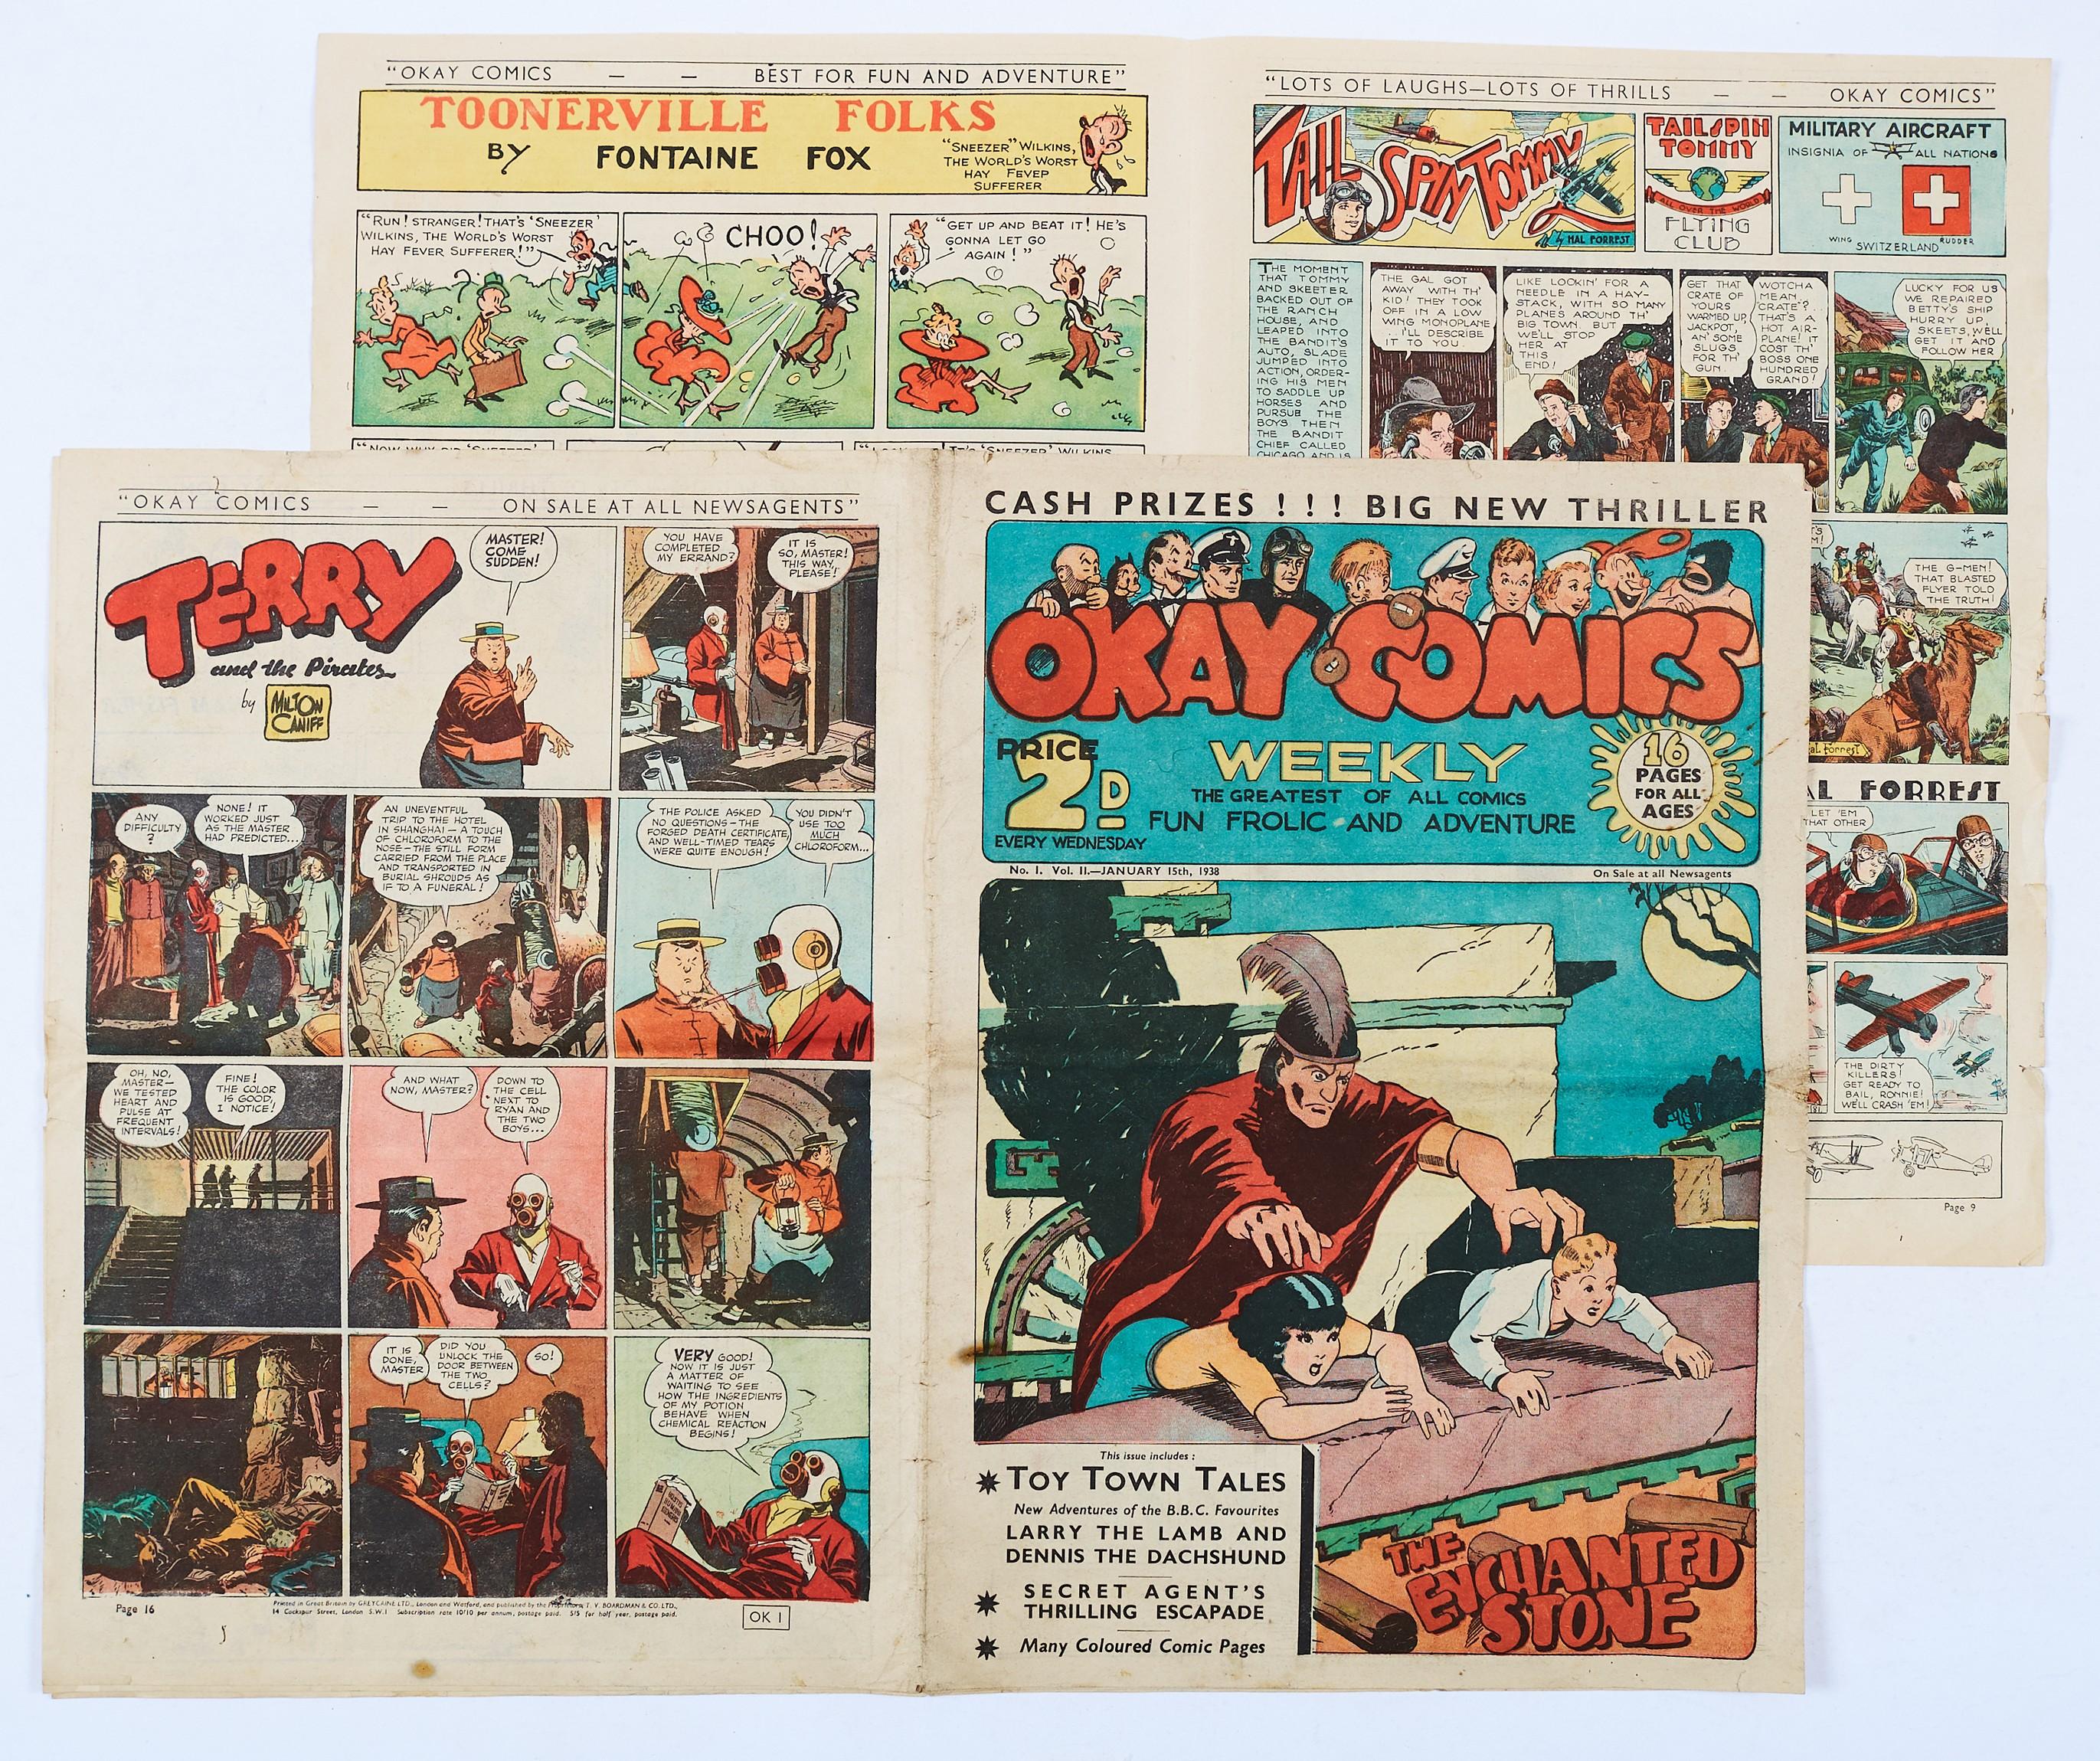 Lot 13 - Okay Comics (1938 T.V. Boardman) No 1, Vol 2. UK reprints of Mutt & Jeff. Smokey Stover, Toonerville